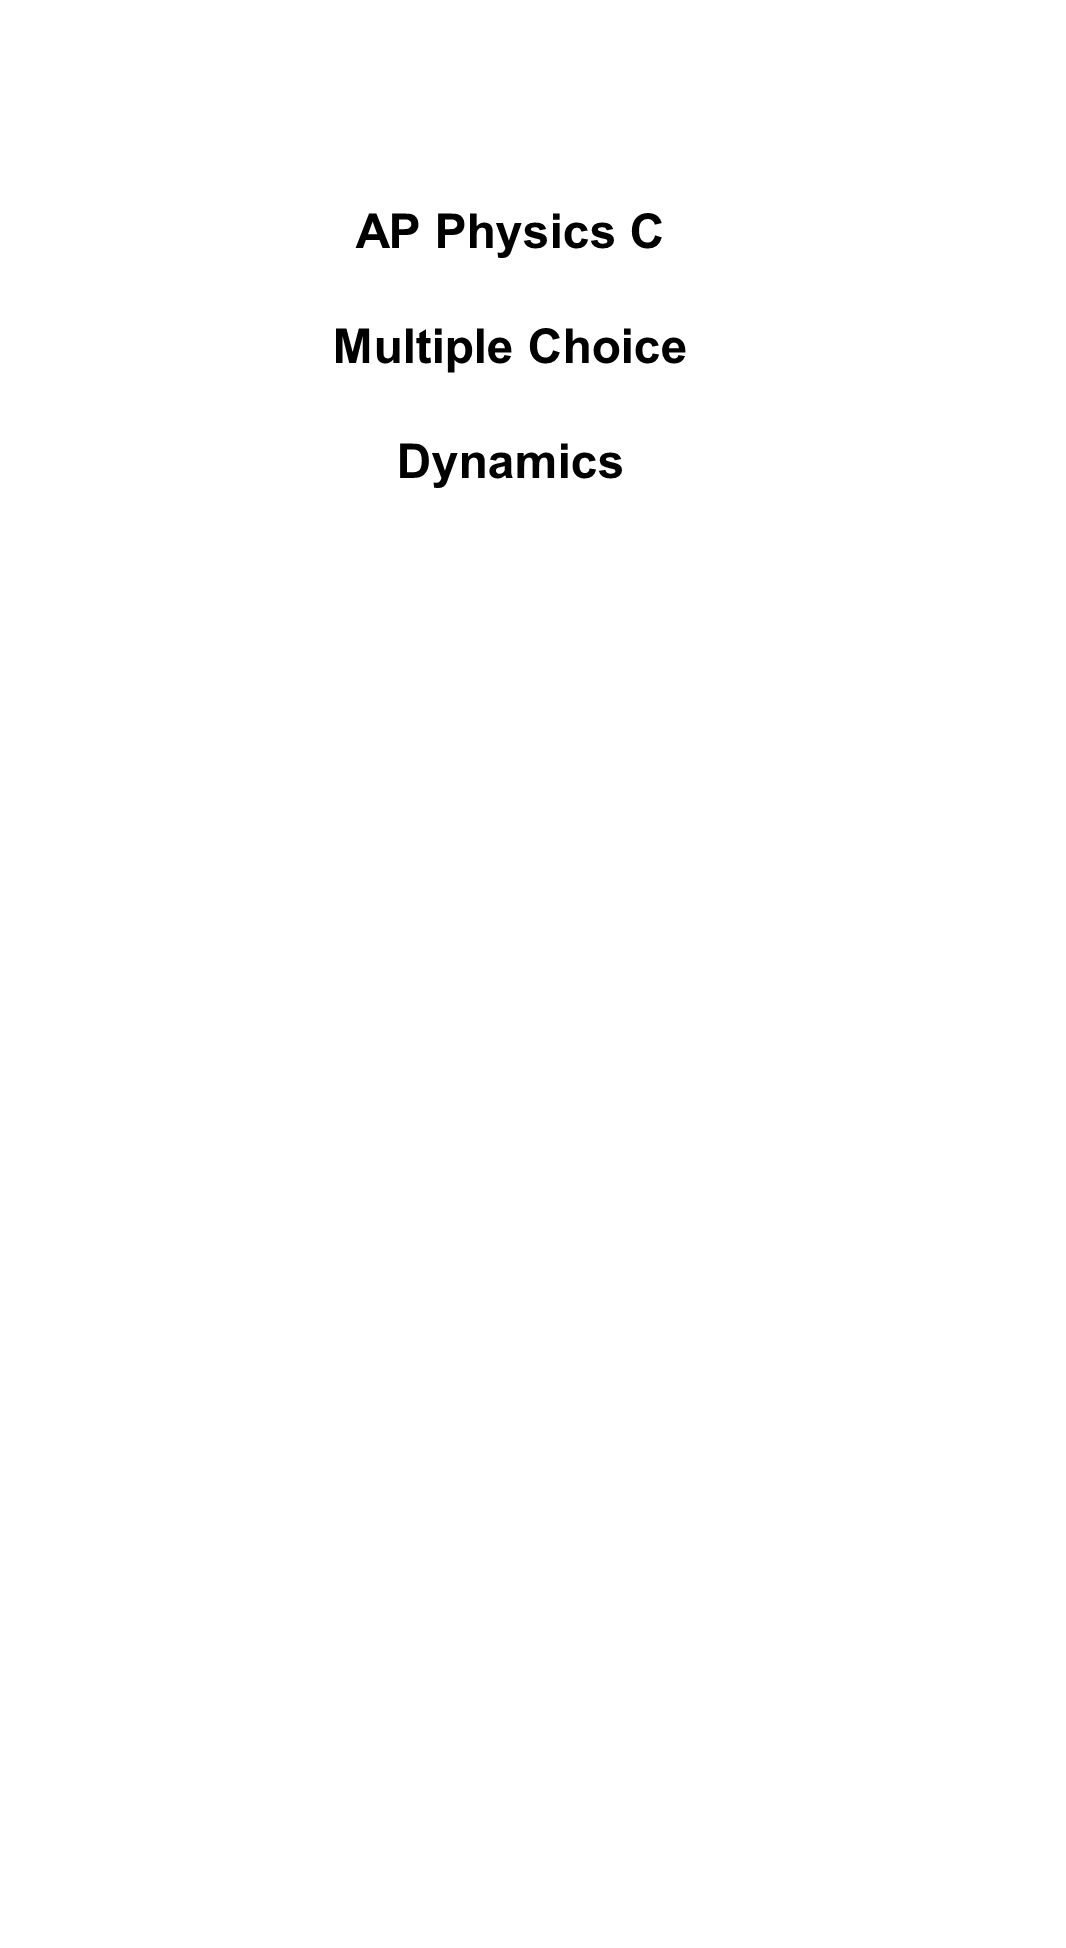 AP Physics C Multiple Choice Dynamics